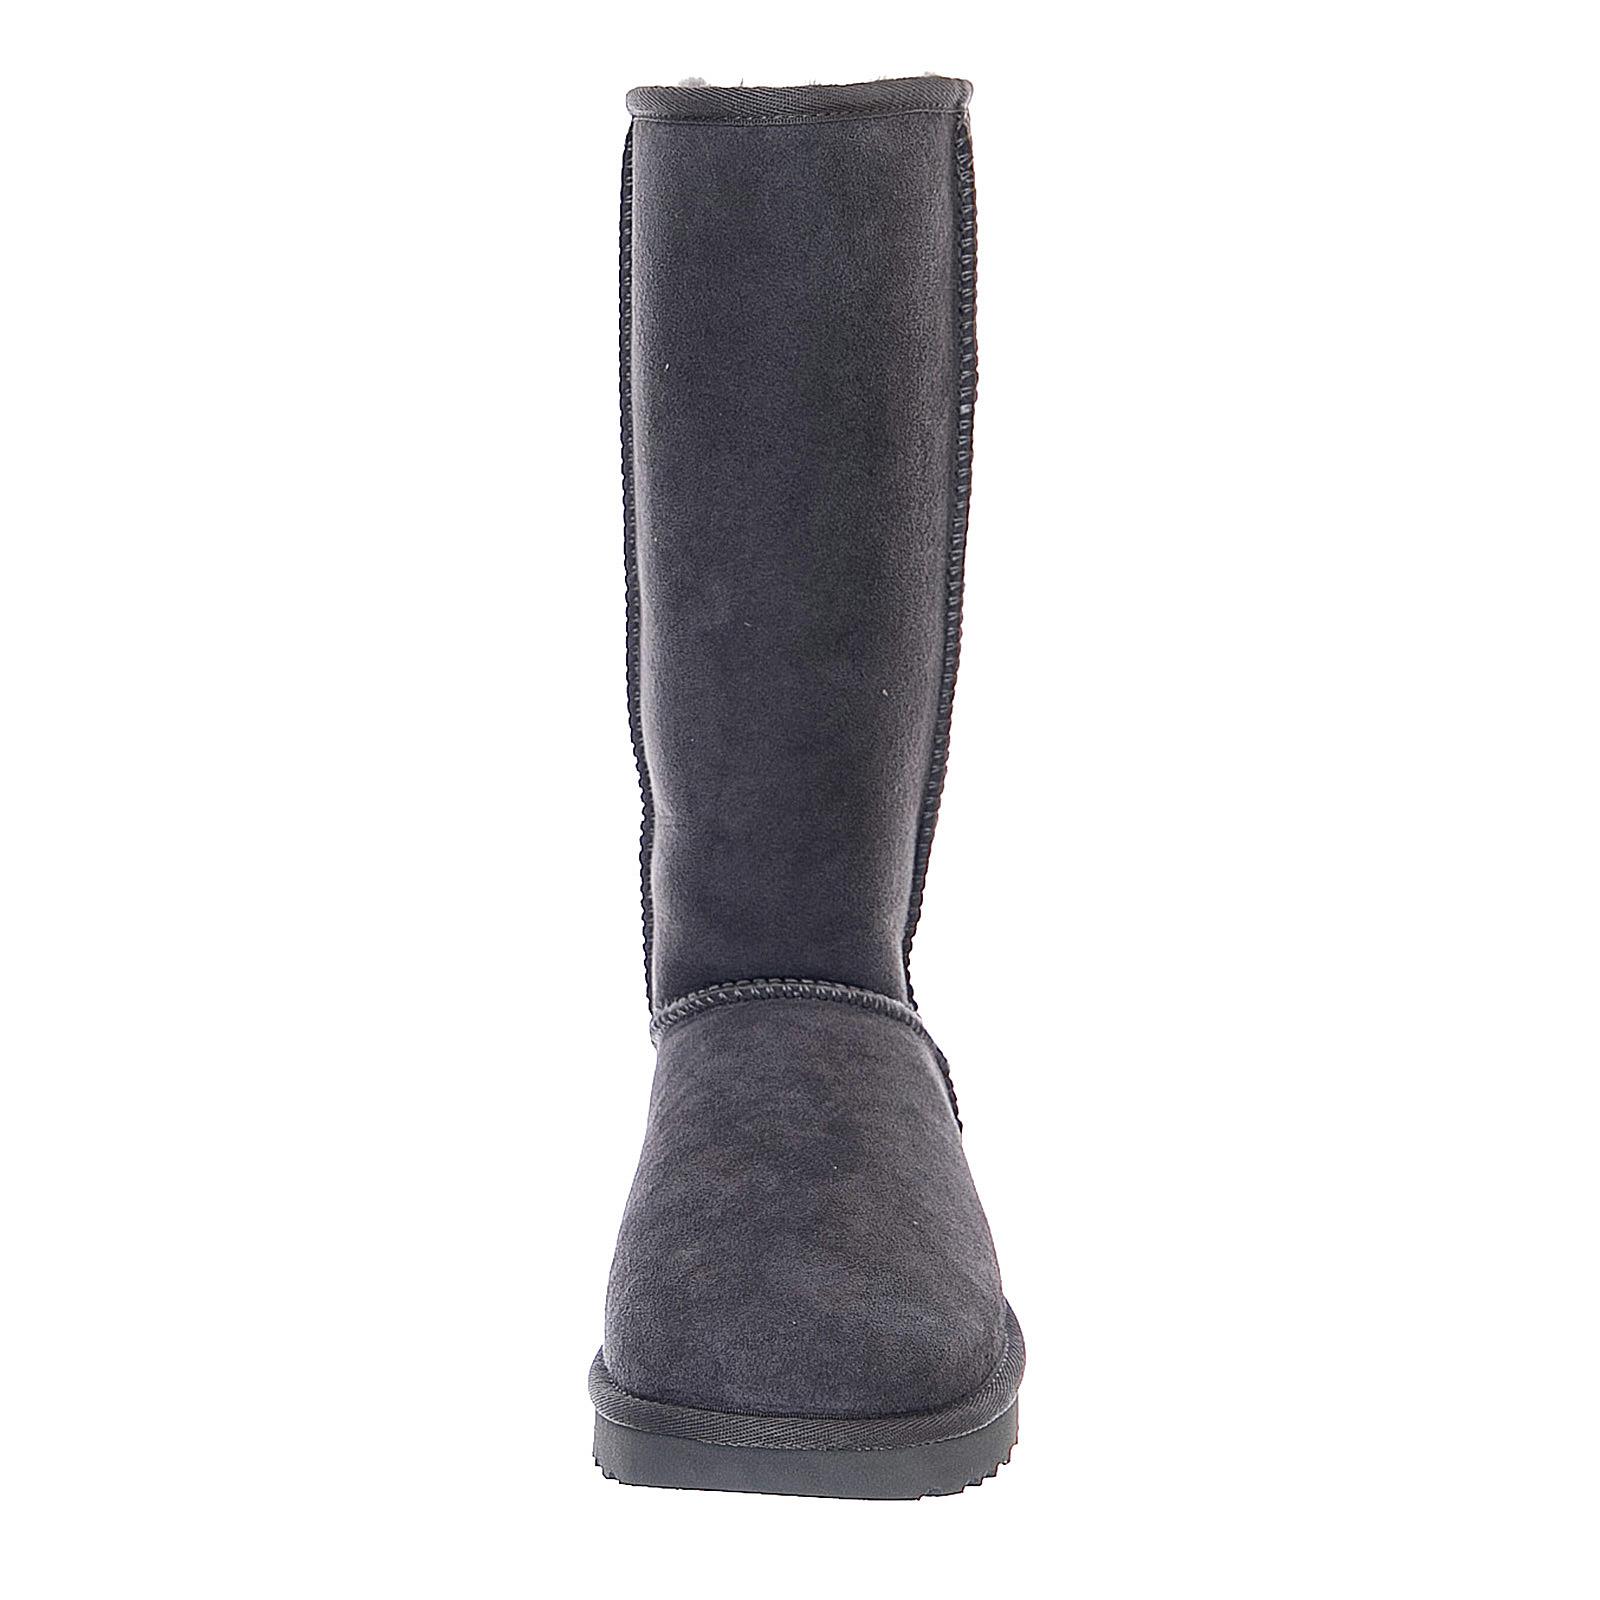 Ii Gris Ugg Tall Grey Classic pour Bottes Femmes Enx1qP6